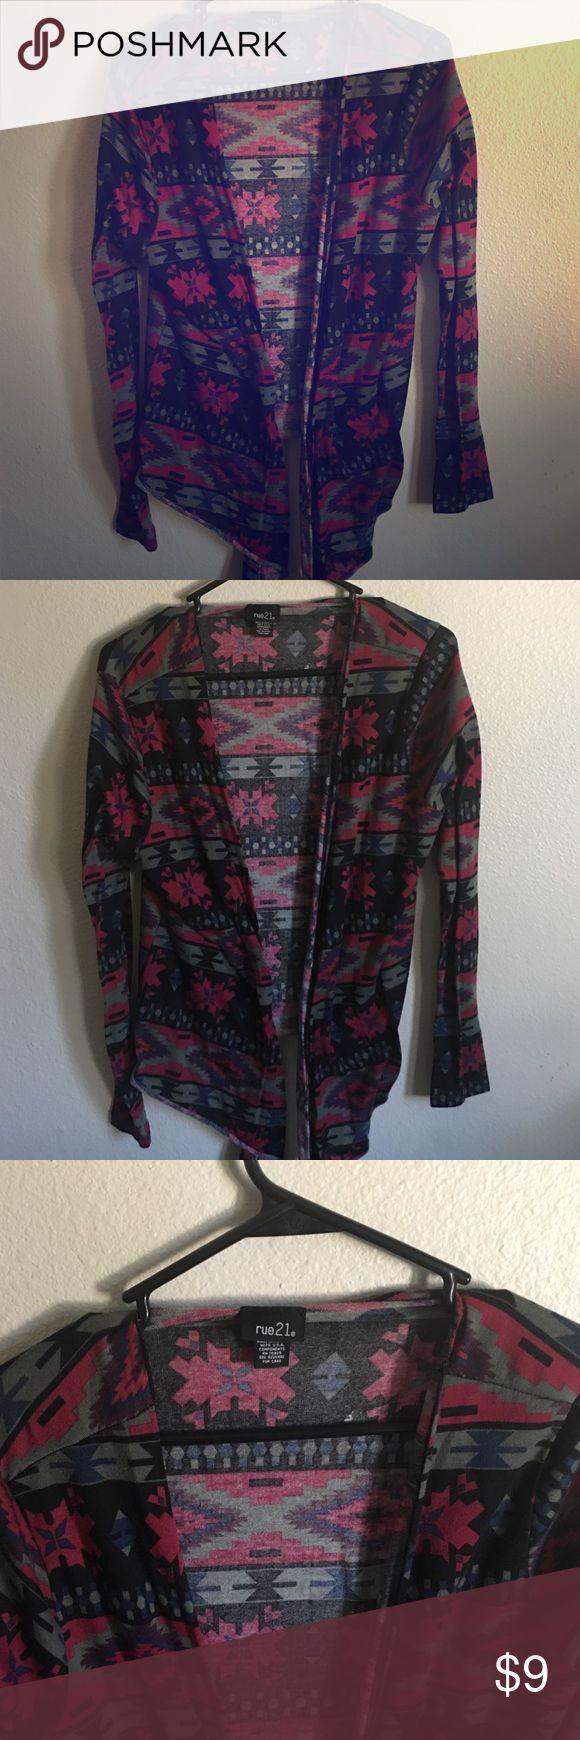 Rue21 tribal cardigan Multicolor tribal cardigan from rue21. Size XL Rue 21 Tops Sweatshirts & Hoodies